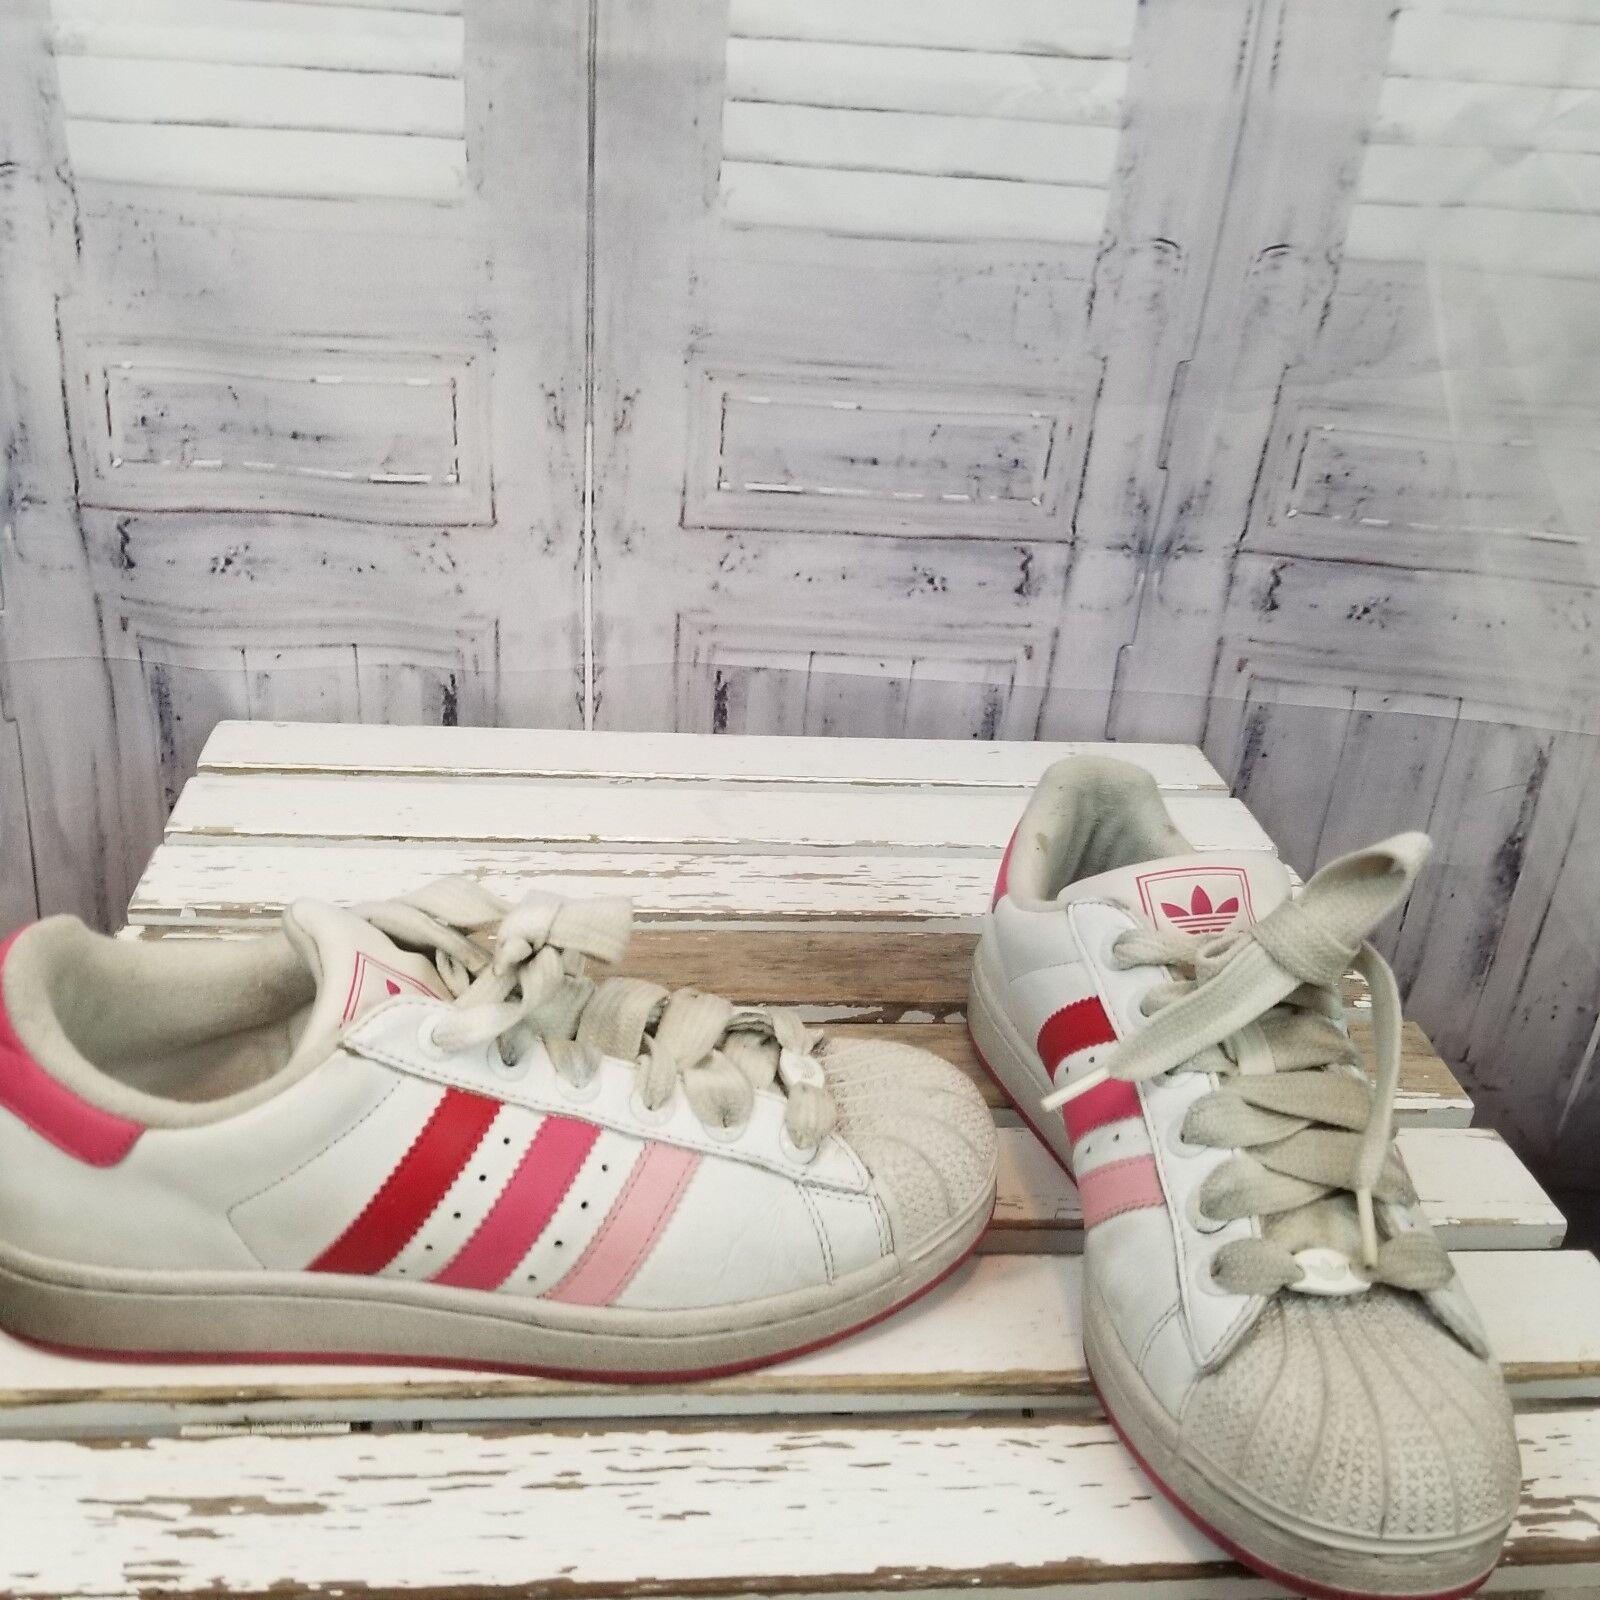 Adidas skater scarpa donne rosa - bianco 8 723001 2006 piatta striscia scarpe da tennis   Vogue    Scolaro/Ragazze Scarpa